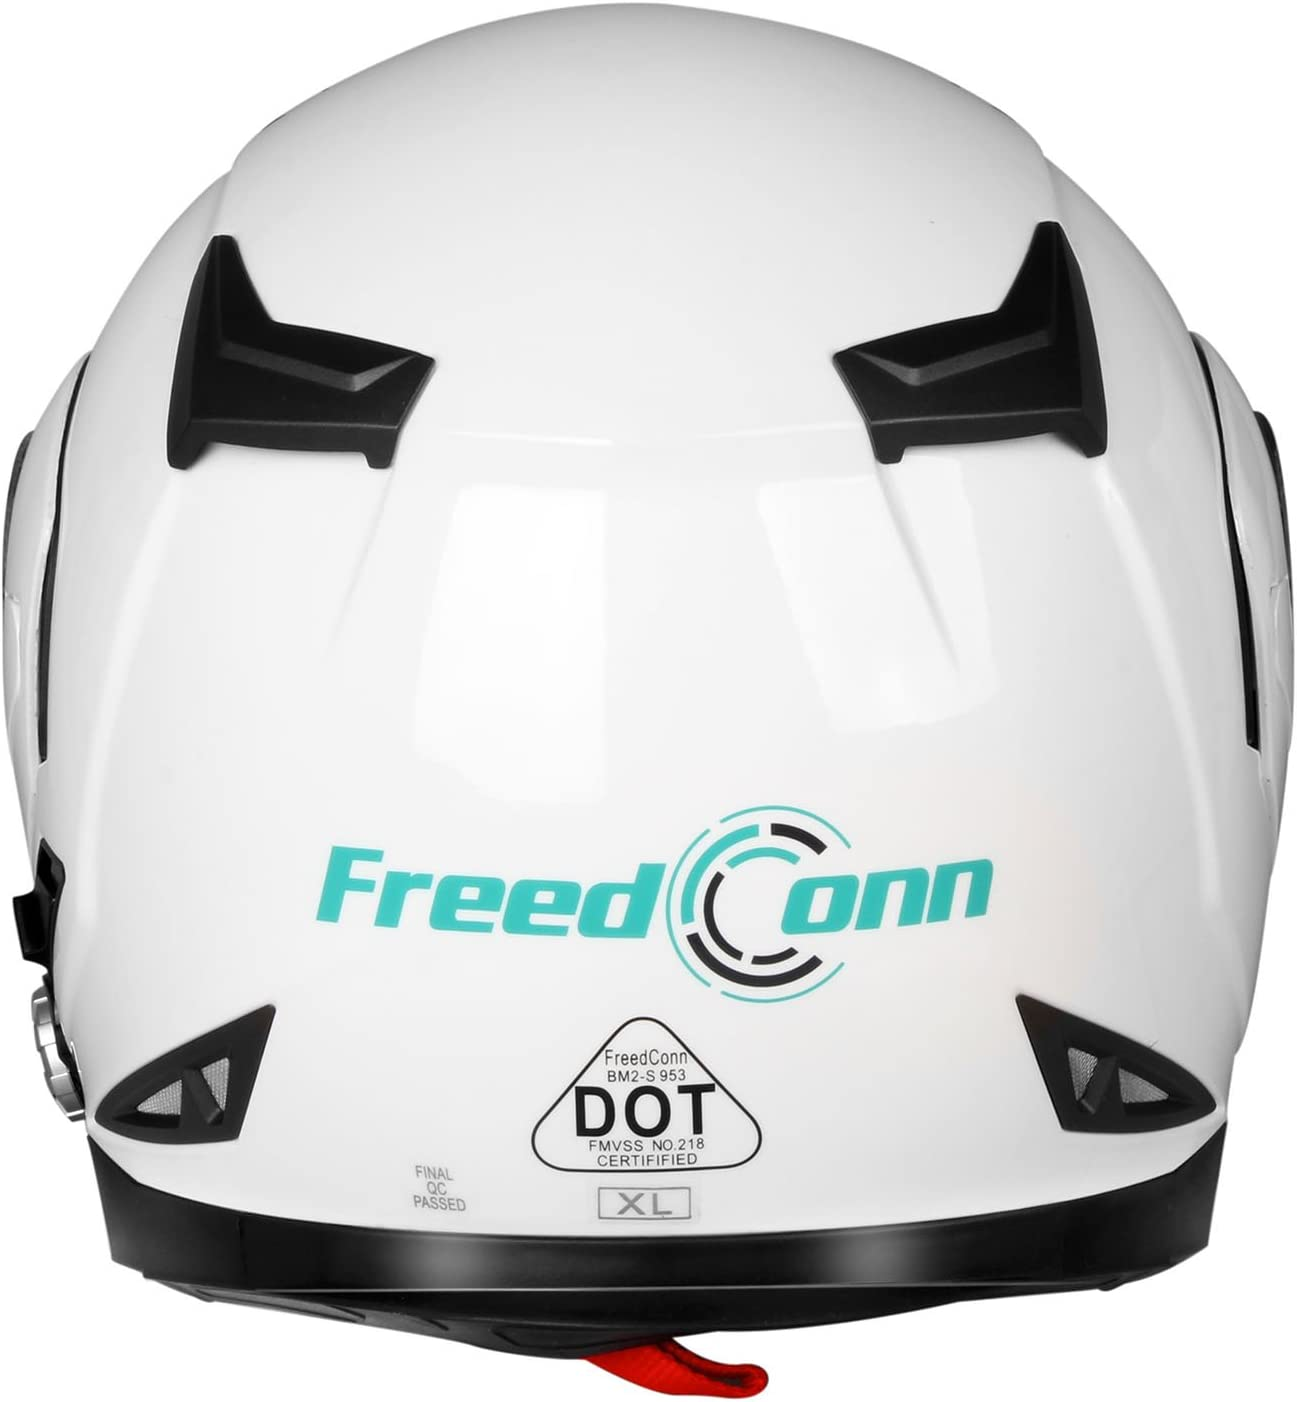 Range 500M,2-3Riders Pairing,FM radio,Waterproof Matte Black, XL Motorcycle Bluetooth Helmets FreedConn Flip up Dual Visors Full Face Helmet Built-in Integrated Intercom Communication System